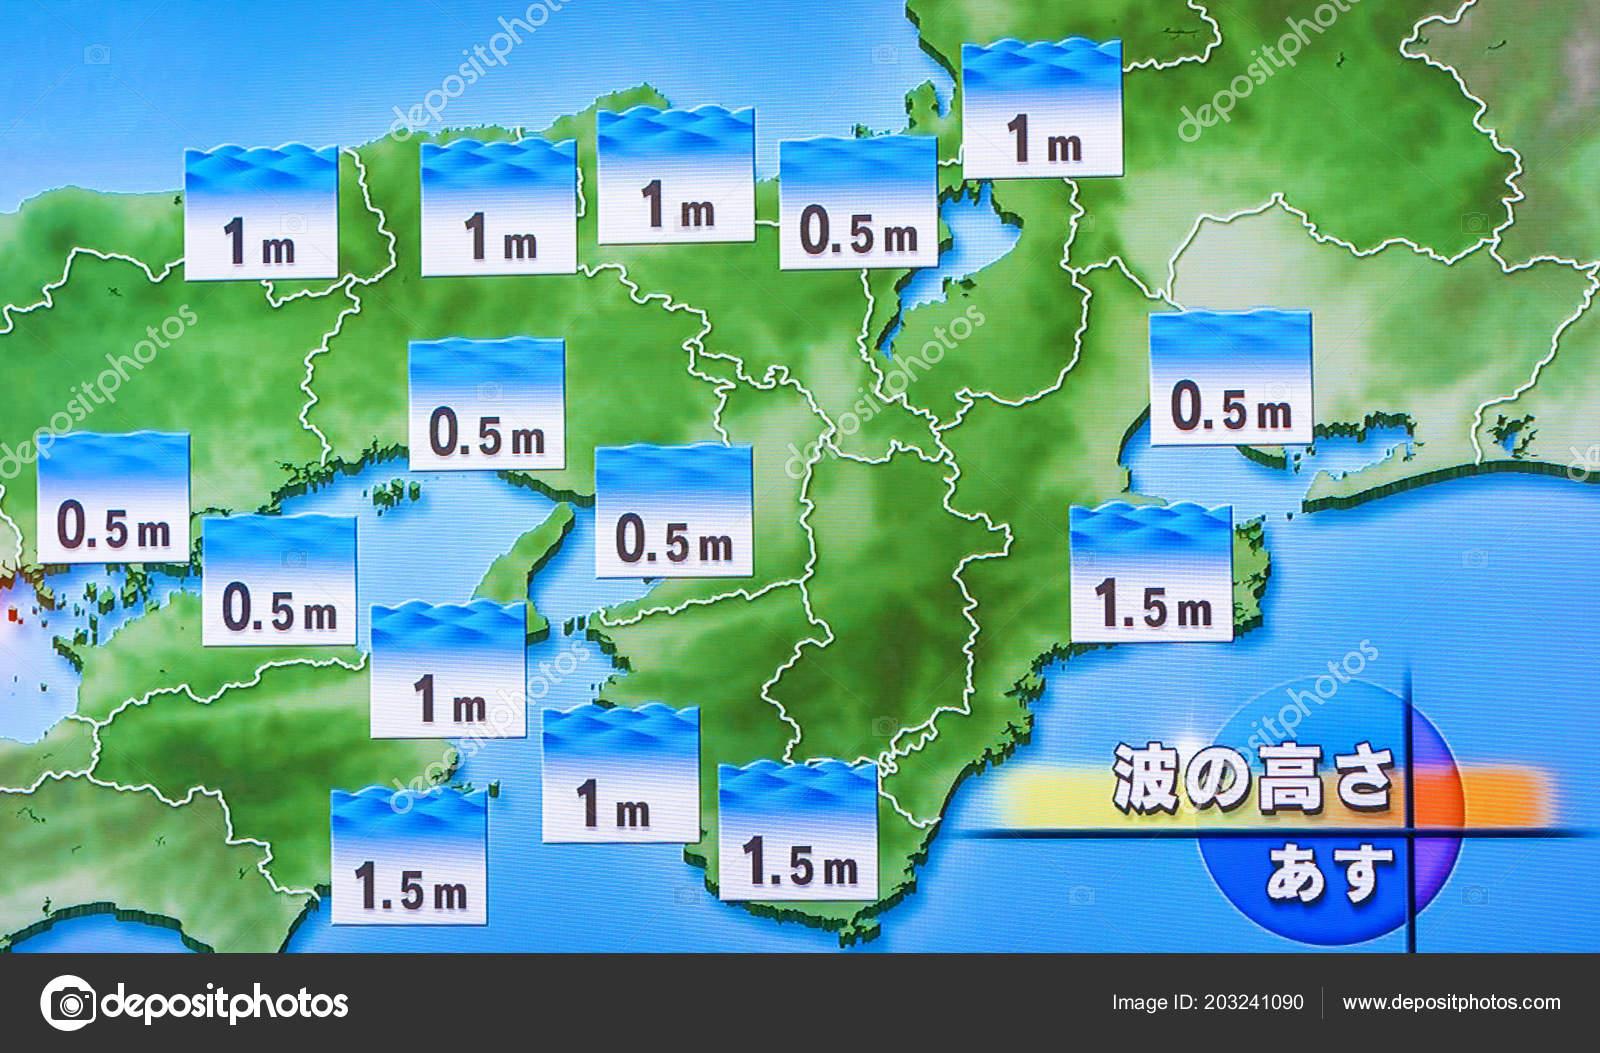 koyasan japan map, osaka japan map, edo japan map, kamakura japan map, toba japan map, capital of japan, hiroshima map, himeji castle, atsugi japan map, sea of japan map, sapporo japan map, yakushima japan map, nagasaki japan map, mount fuji, nara japan map, yamato japan map, osaka castle, kobe japan map, okinawa japan map, bali indonesia map, maizuru japan map, yokohama japan map, agra map, mt. fuji japan map, on kyoto japan map